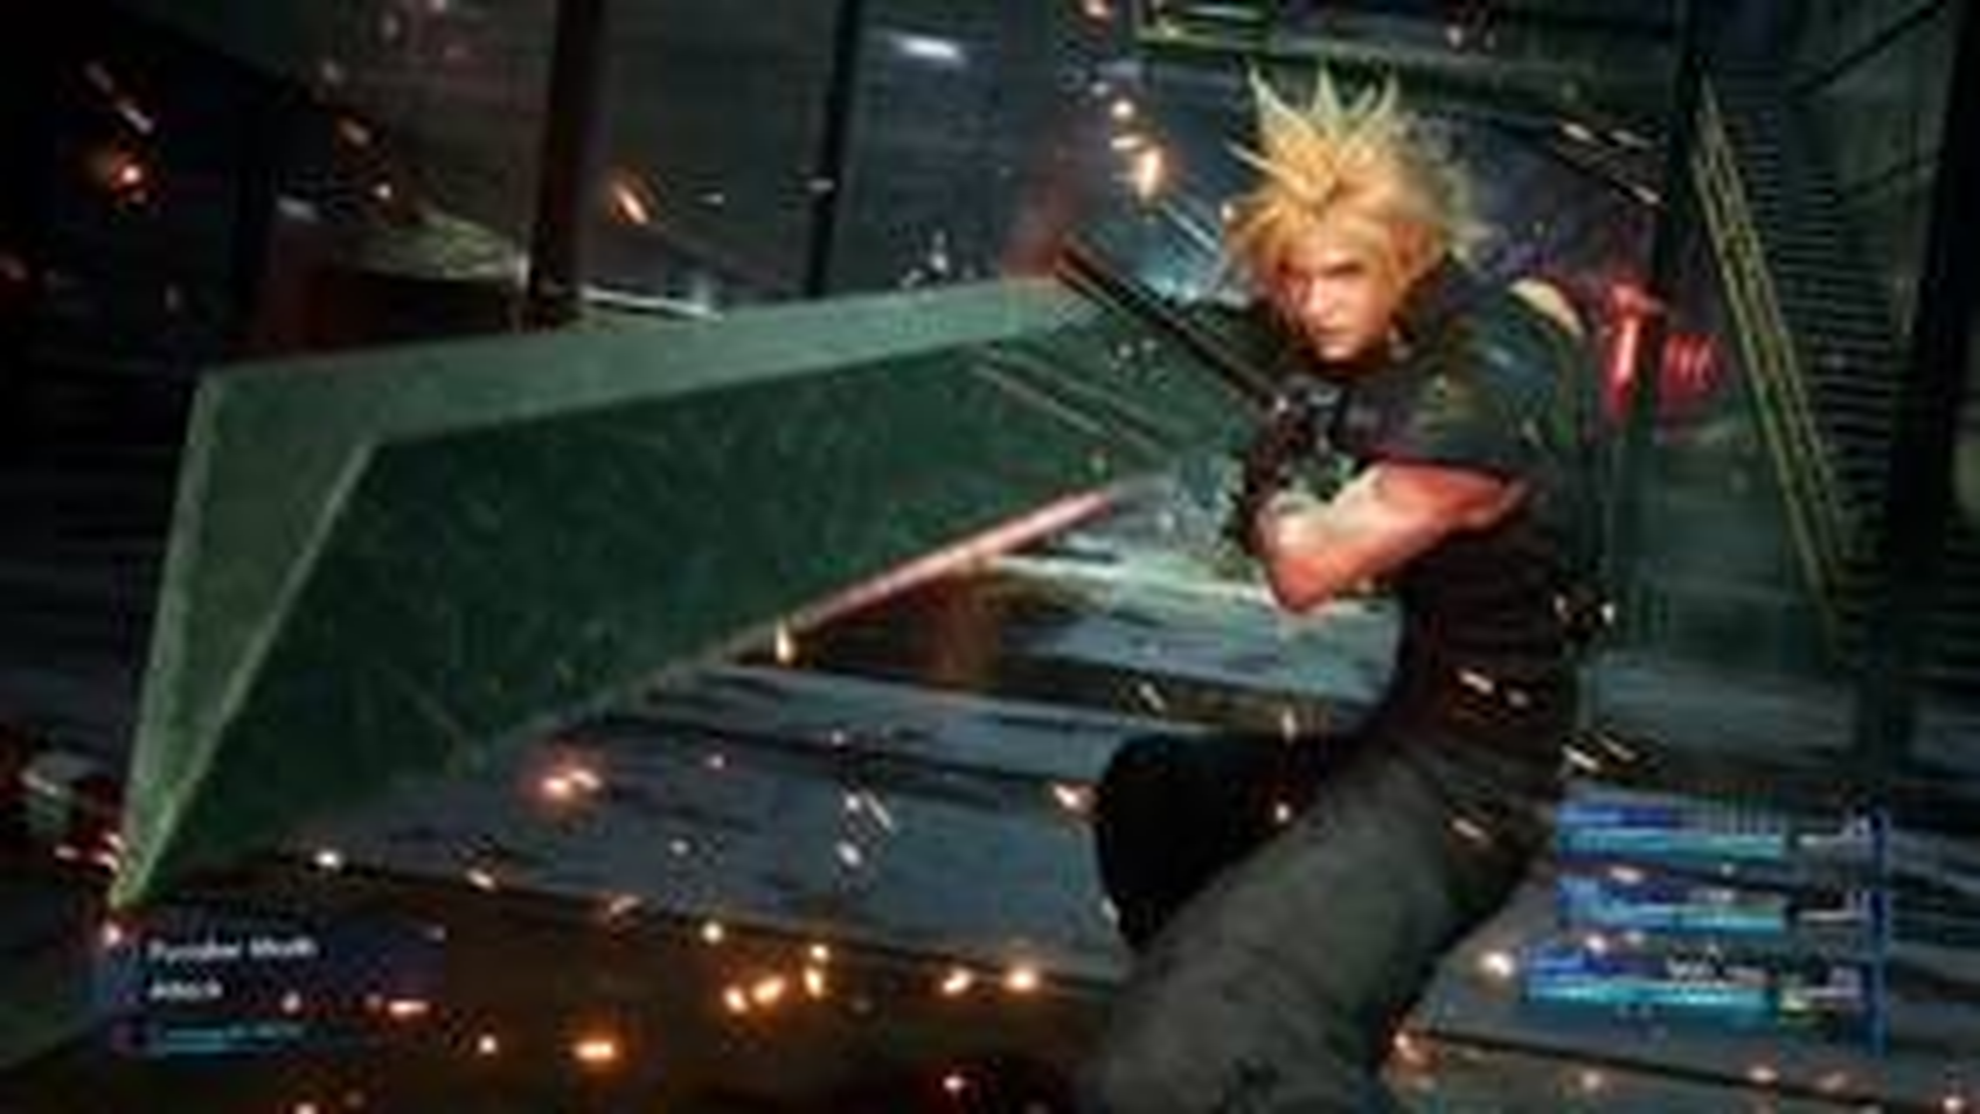 Image for E3 2019 Game Critics Awards - Final Fantasy 7 Remake wins Best of Show